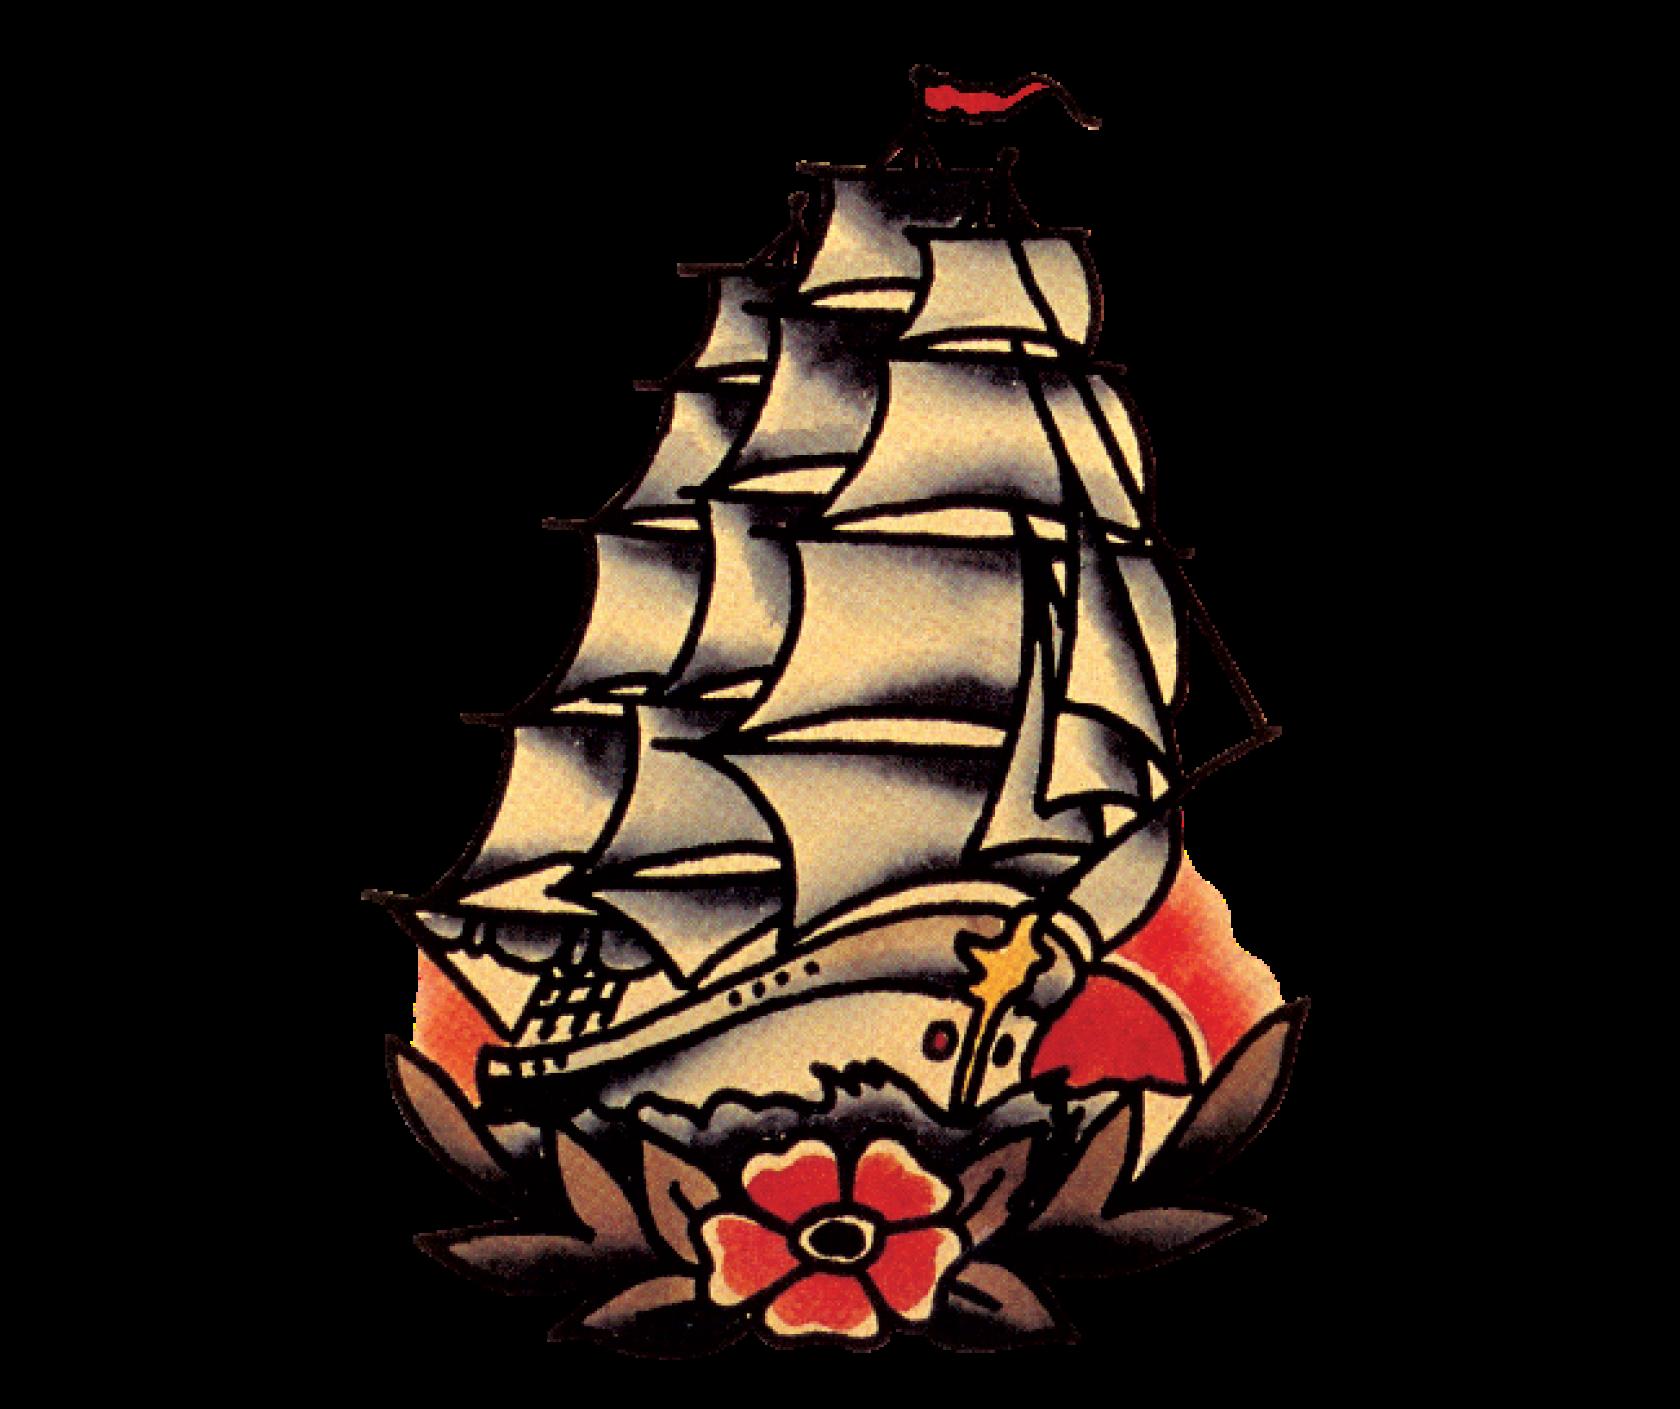 Home windedvoyage com sailoralexwindedvoyageship. Nautical clipart yacht